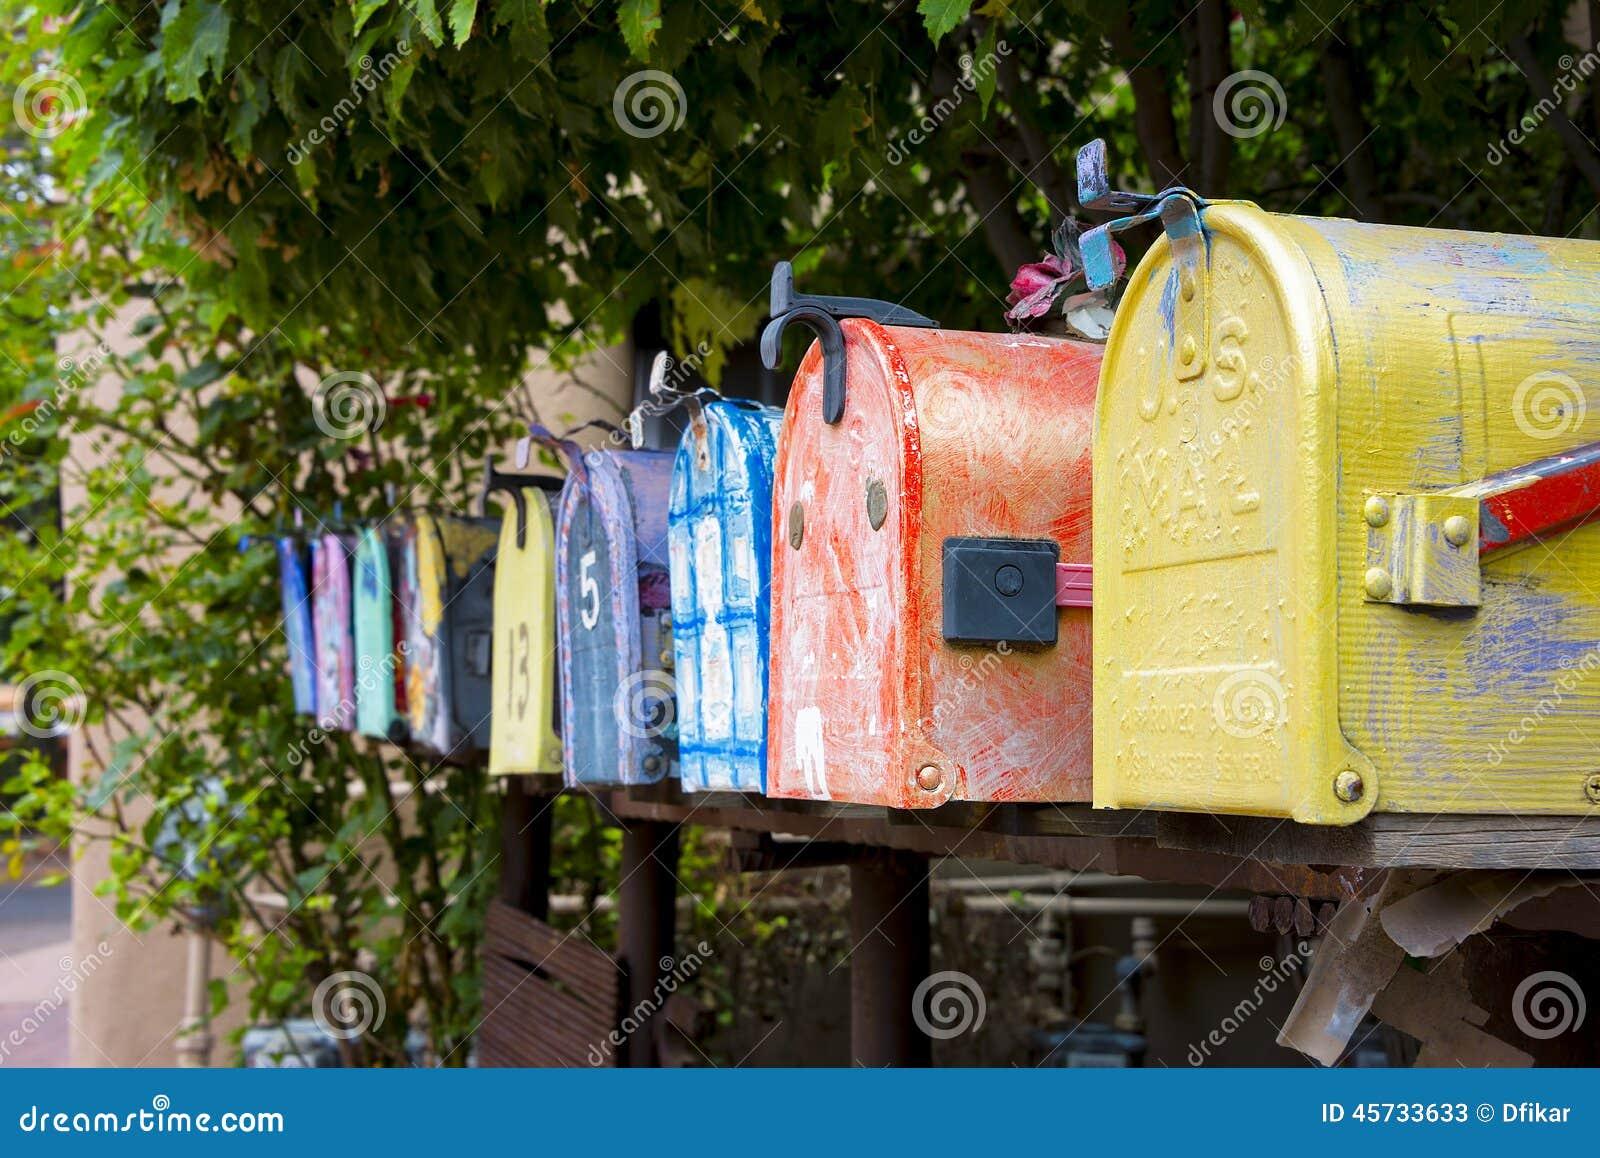 colorful vintage mailboxes stock photo image 45733633. Black Bedroom Furniture Sets. Home Design Ideas